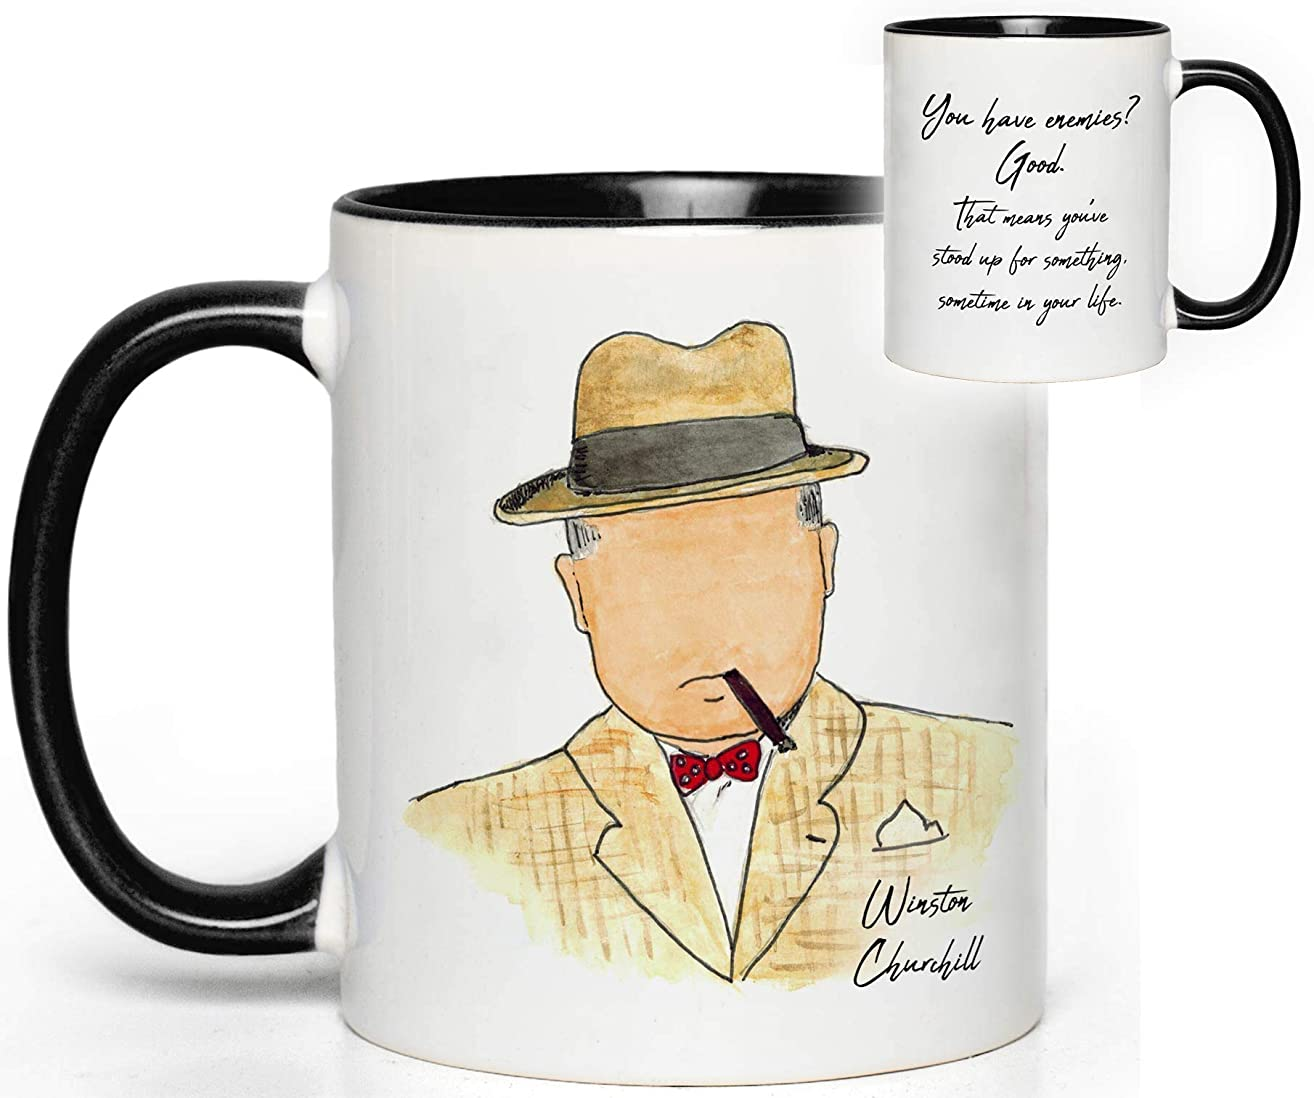 Winston Churchill Quote Mug Gift